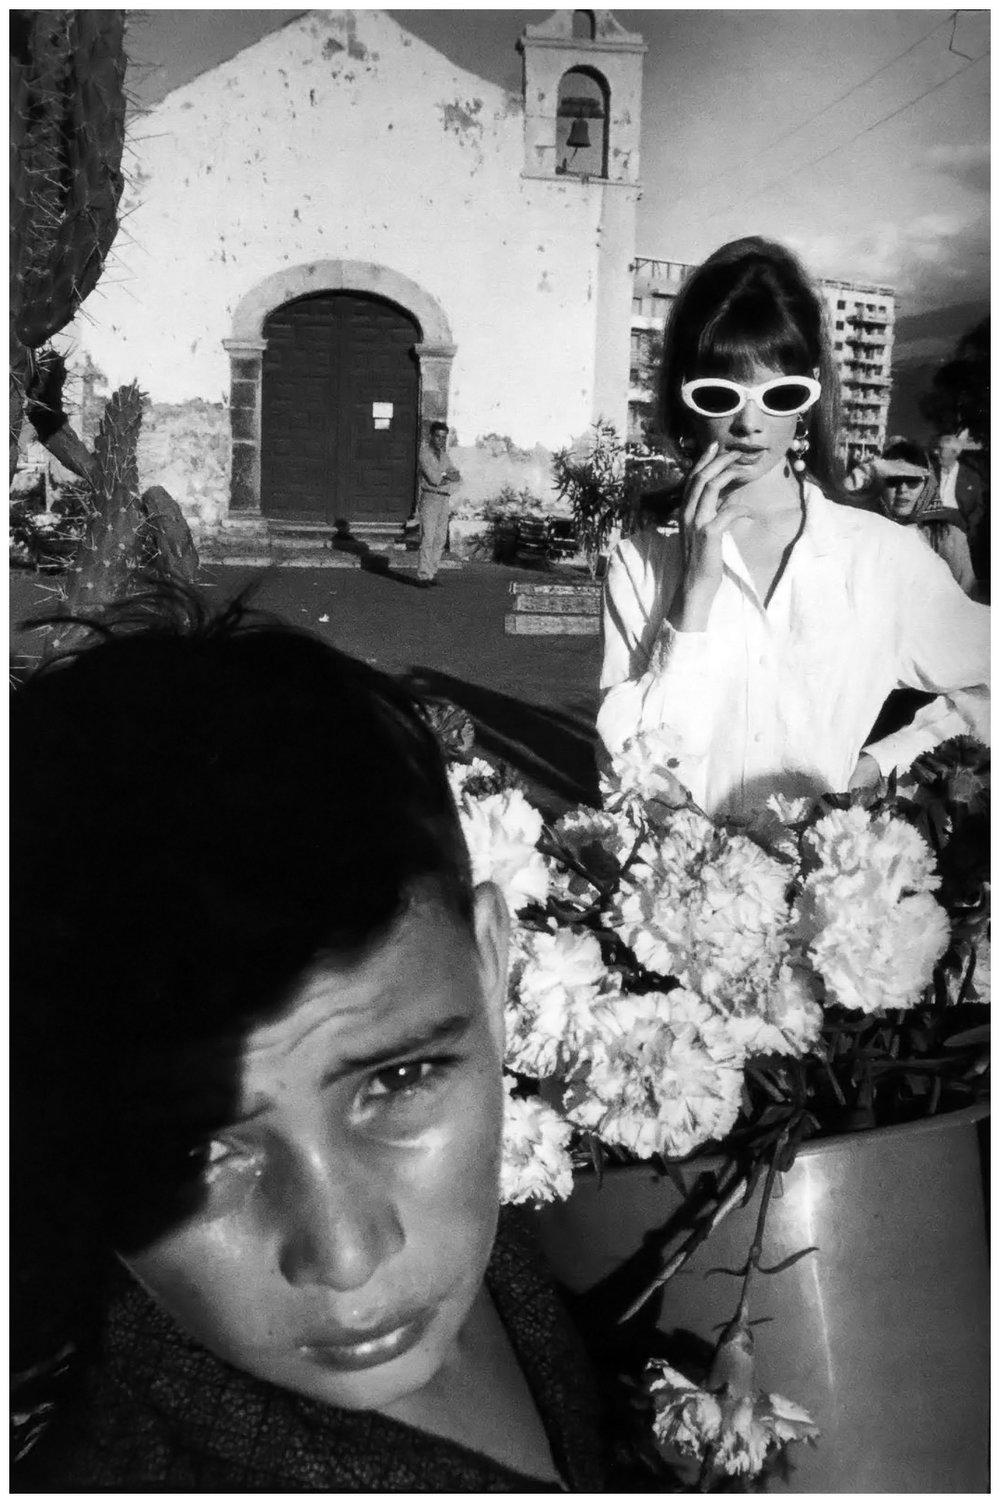 jean-shrimpton-amazing-jean-shrimpton-mexico-vogue-january-1963-unpublished-c2a9-david-bailey